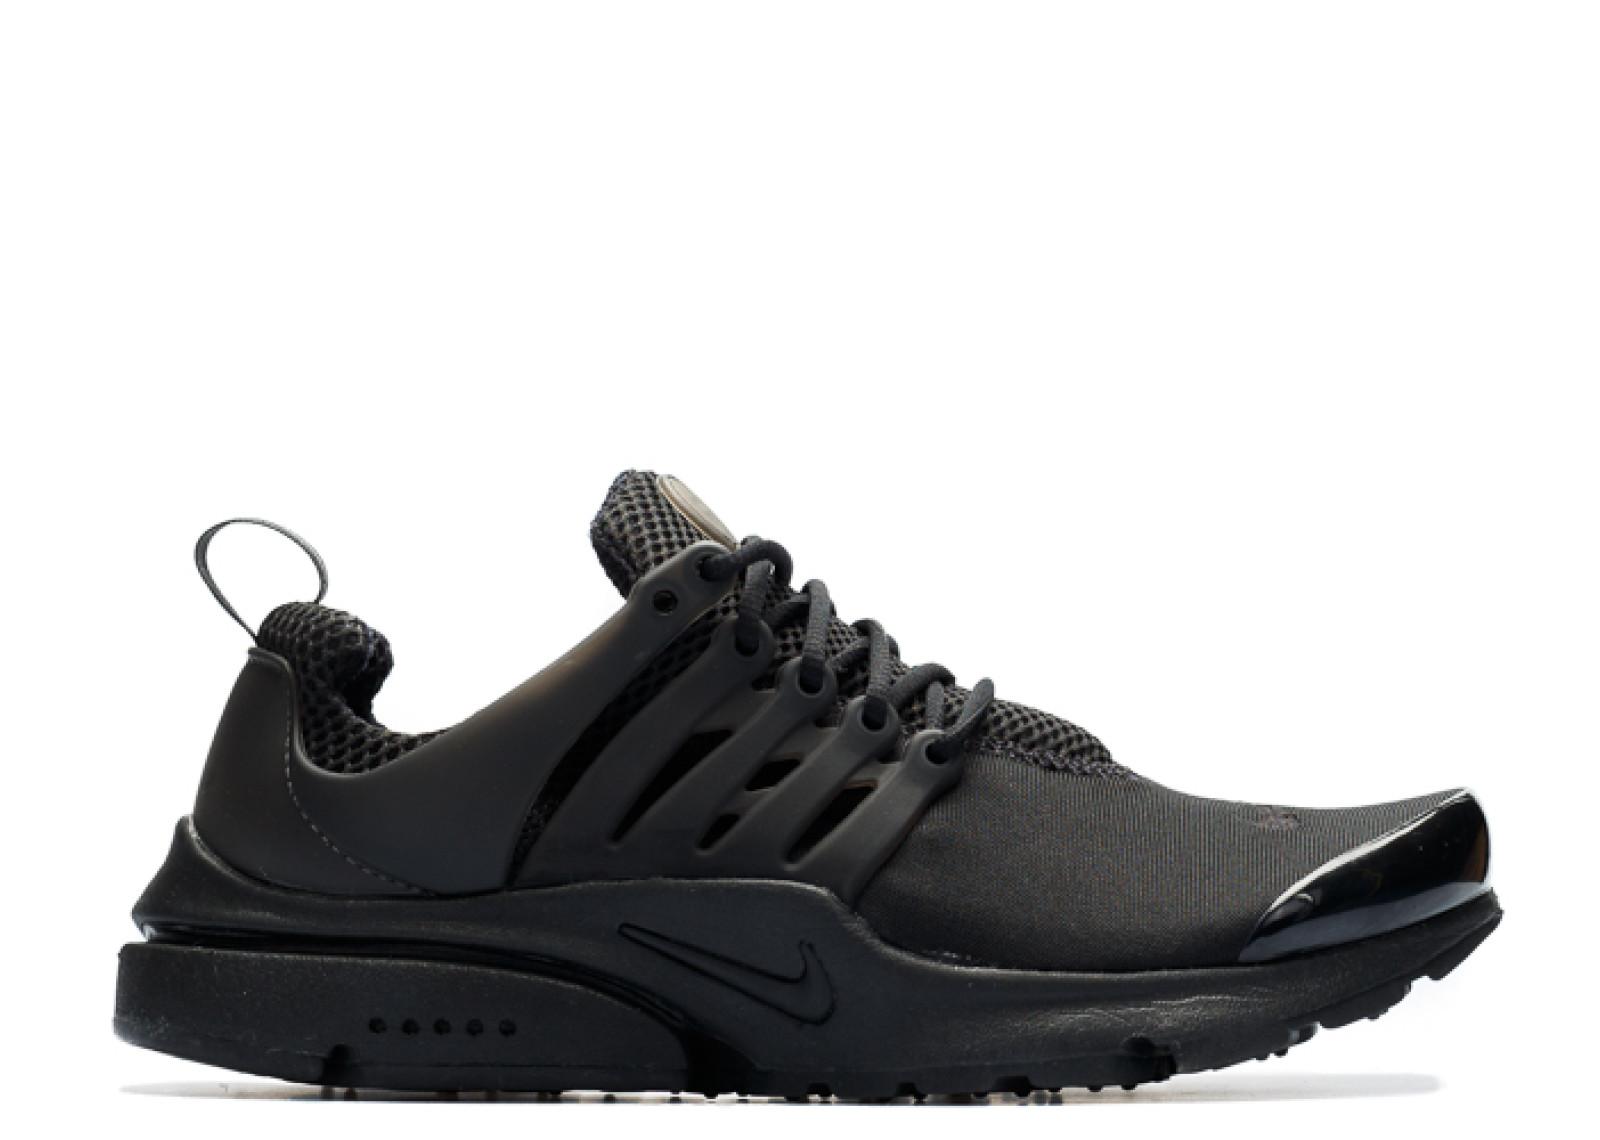 Nike AIR PRESTO  TRIPLE BLACK  - 305919-009 422ead558